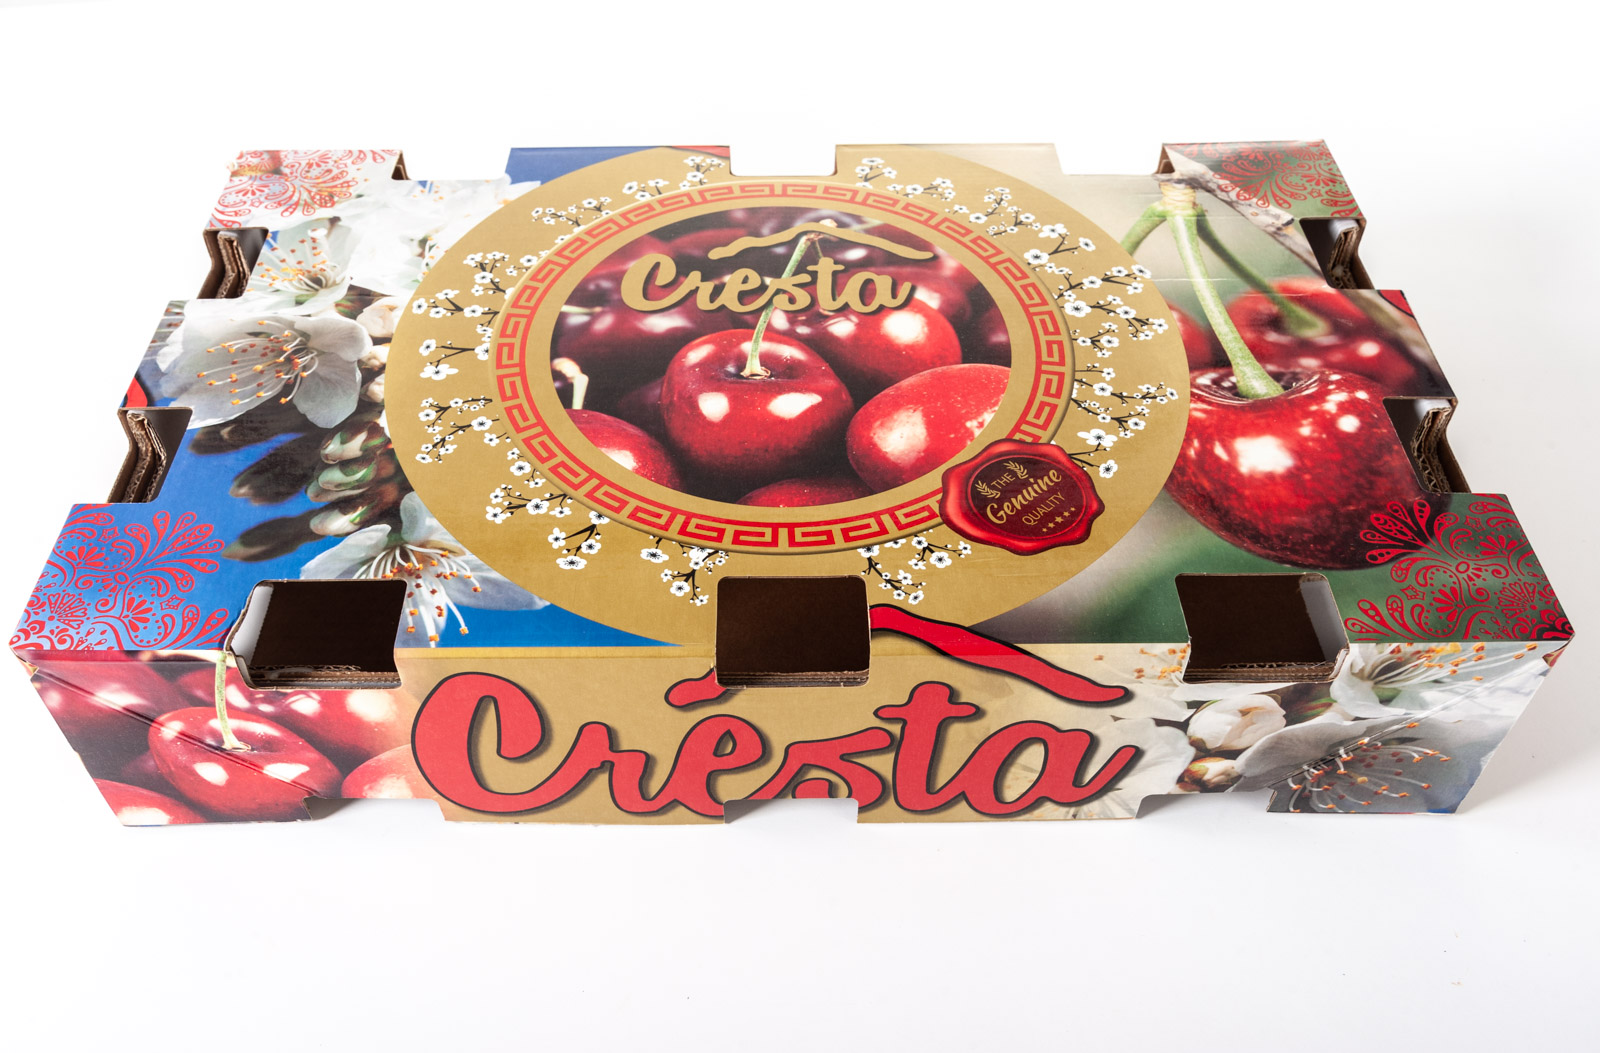 Diseño envase de cartón para Cerezas Cresta exportación - Imagina Arte Gráfico